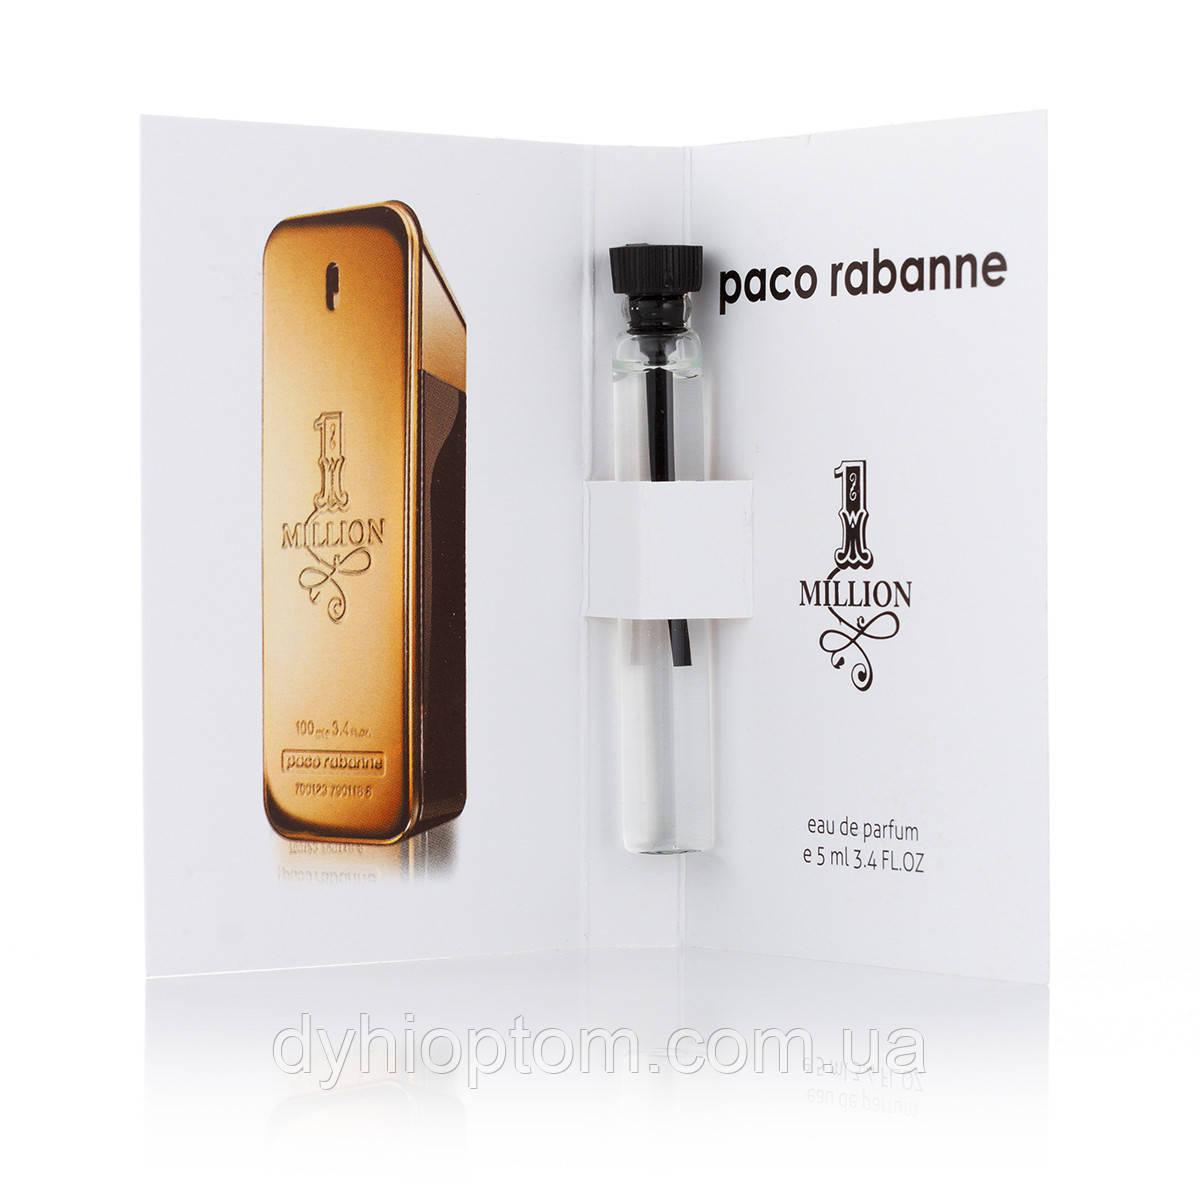 Пробник парфюмированный 5 мл Paco Rabanne 1 Million для мужчин